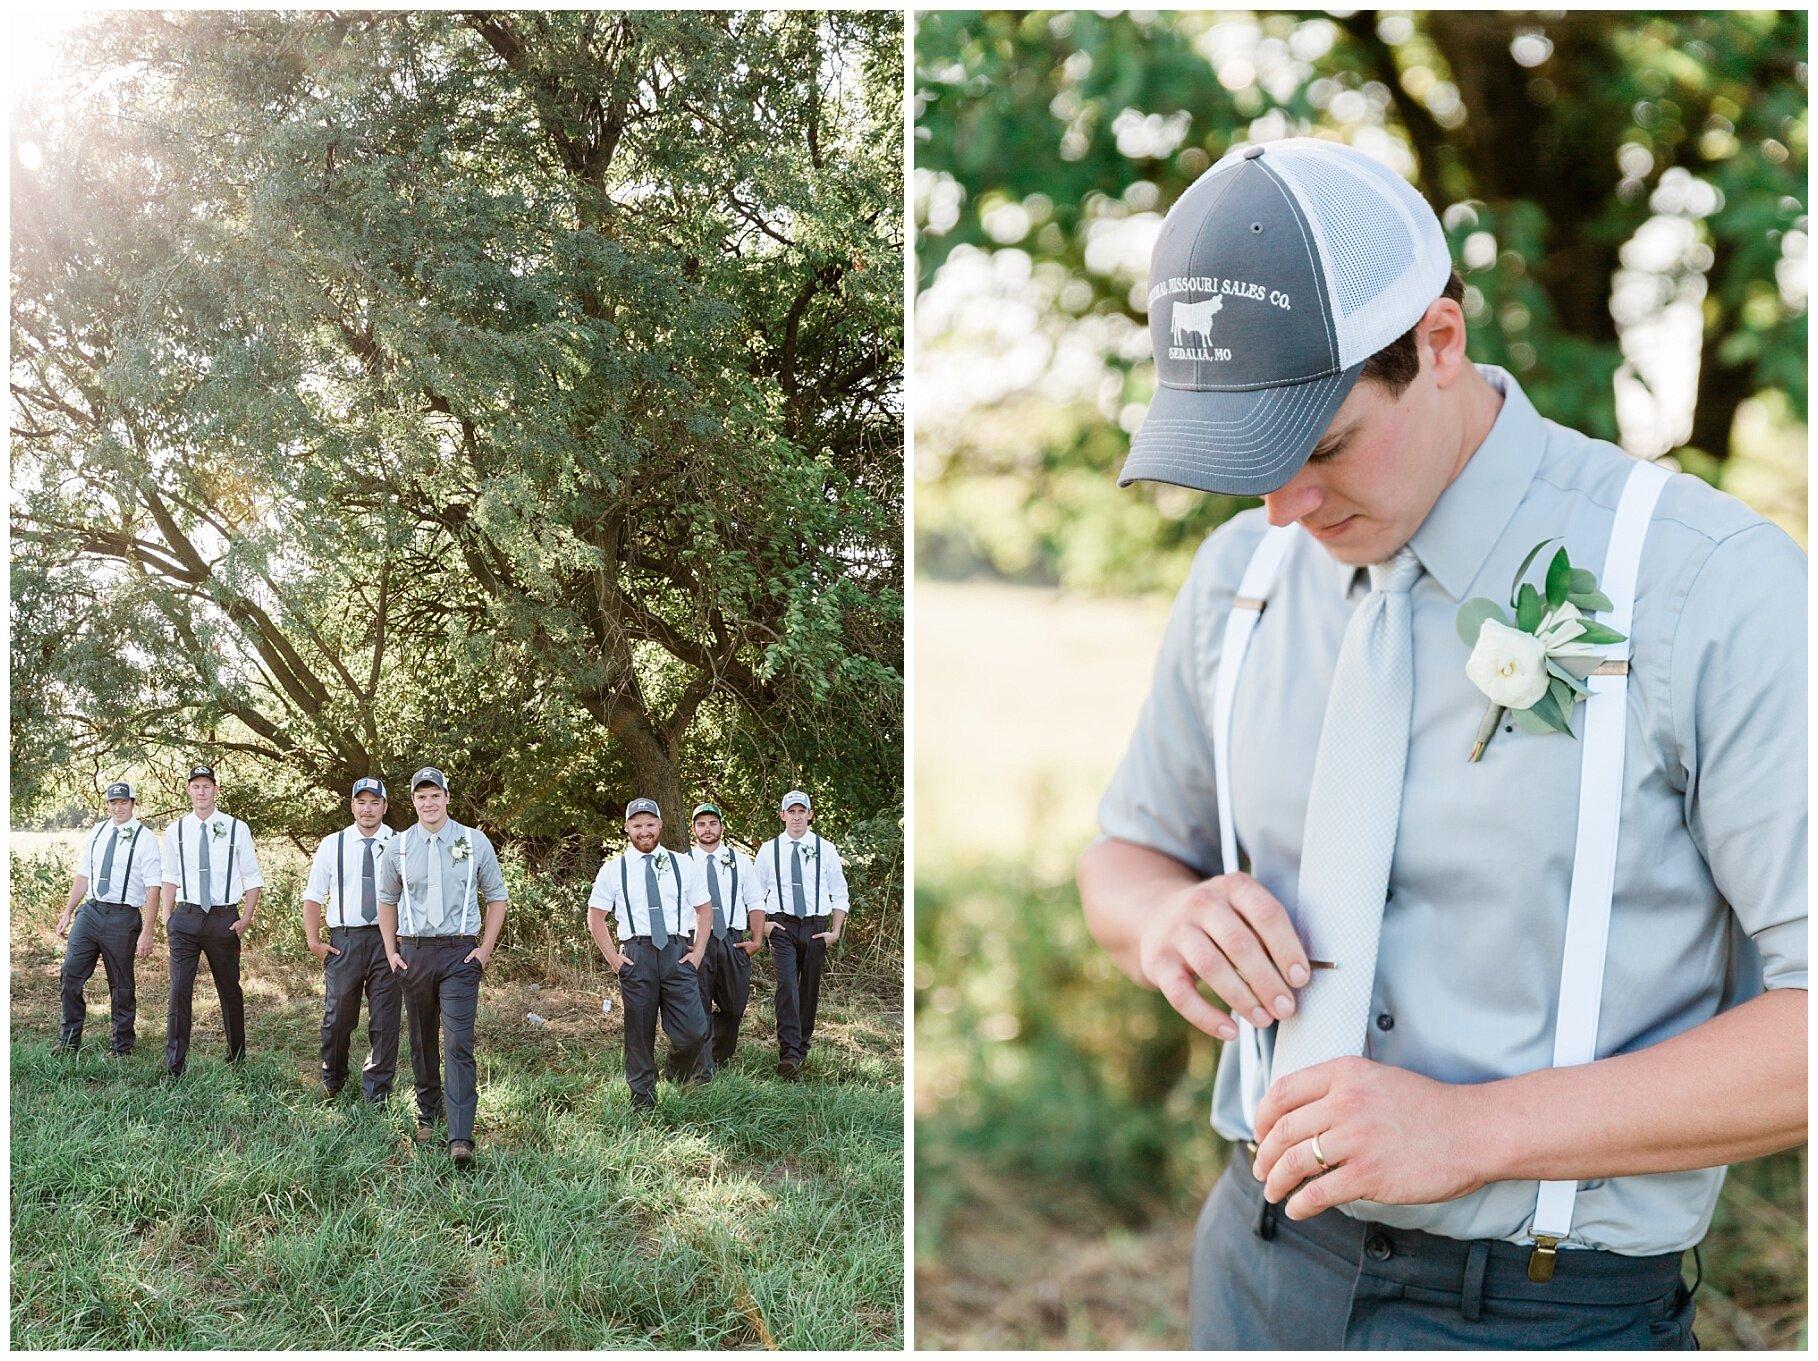 Earth-Toned Wedding by KKP Associate Wedding Photographer and Kelsi Kliethermes Photography Best Columbia Missouri Wedding Photographer_0031.jpg